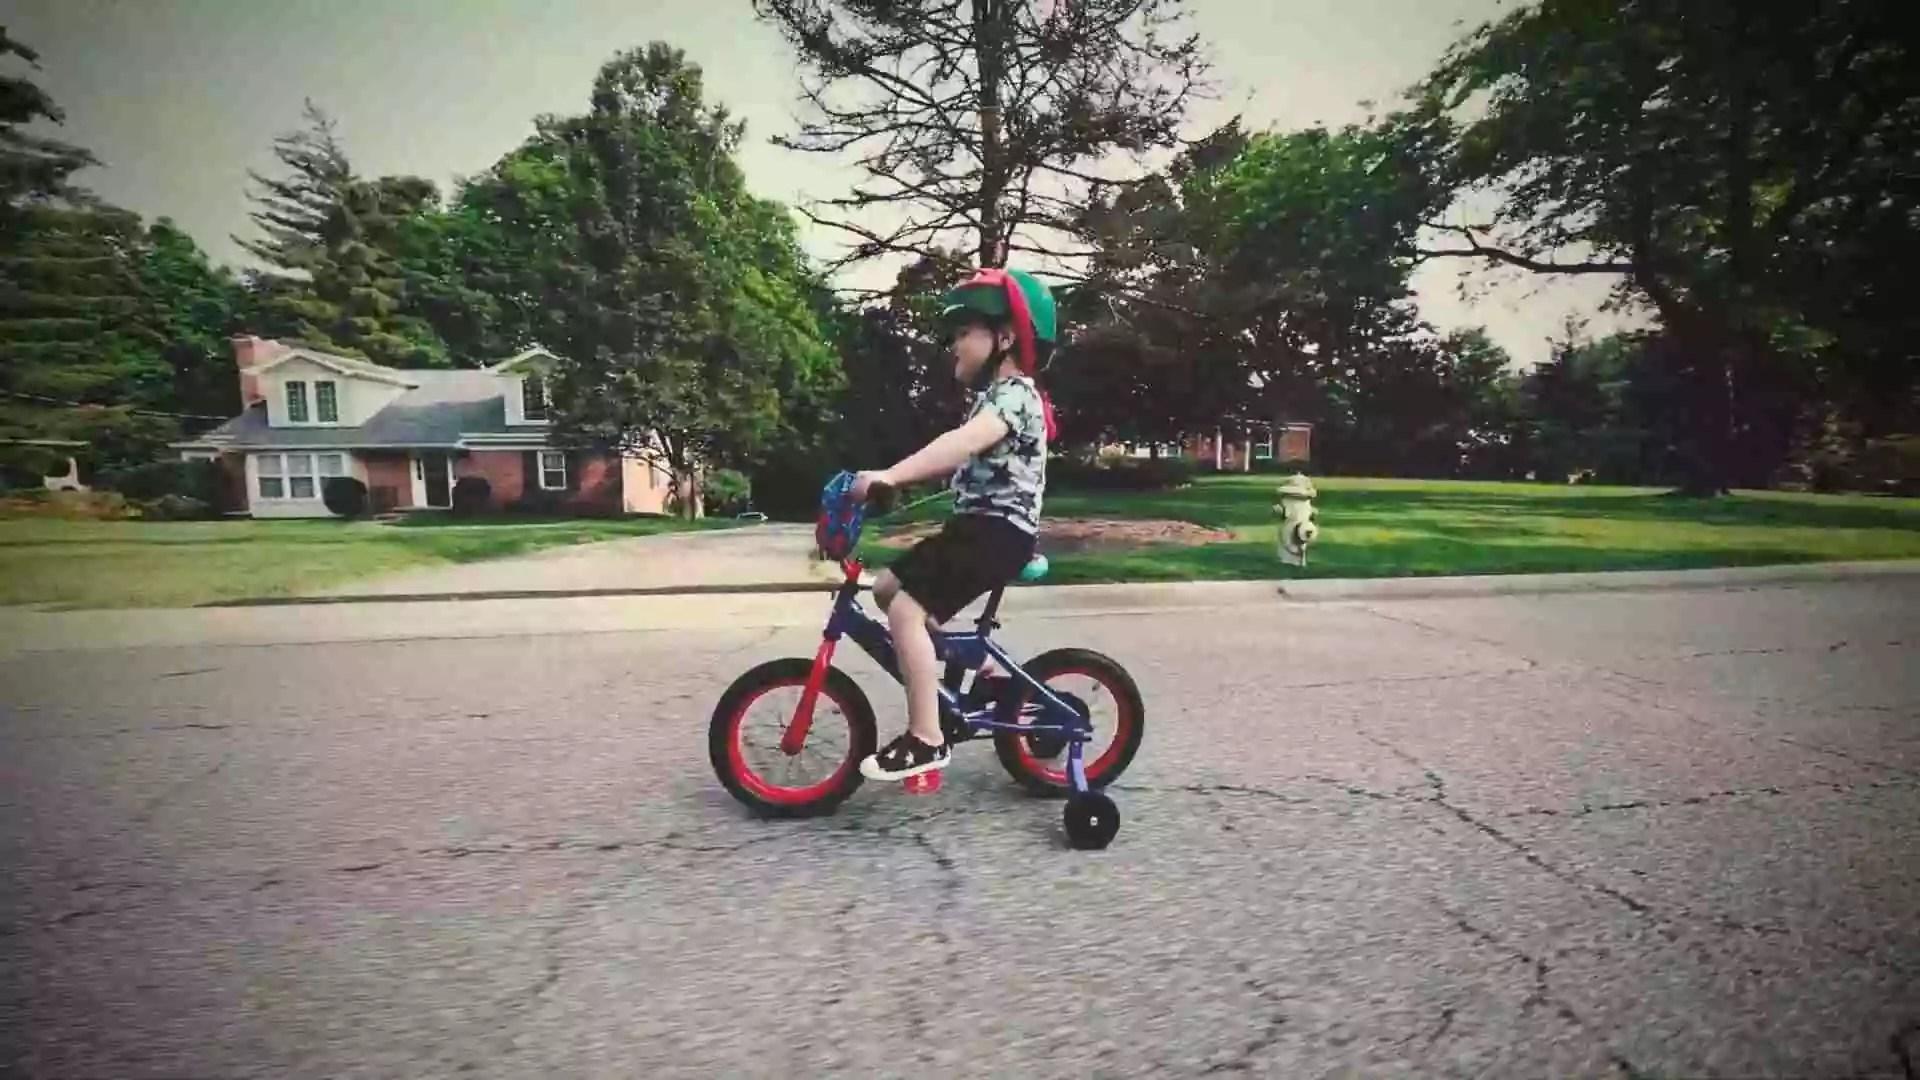 Kid Needs To Wear A Helmet